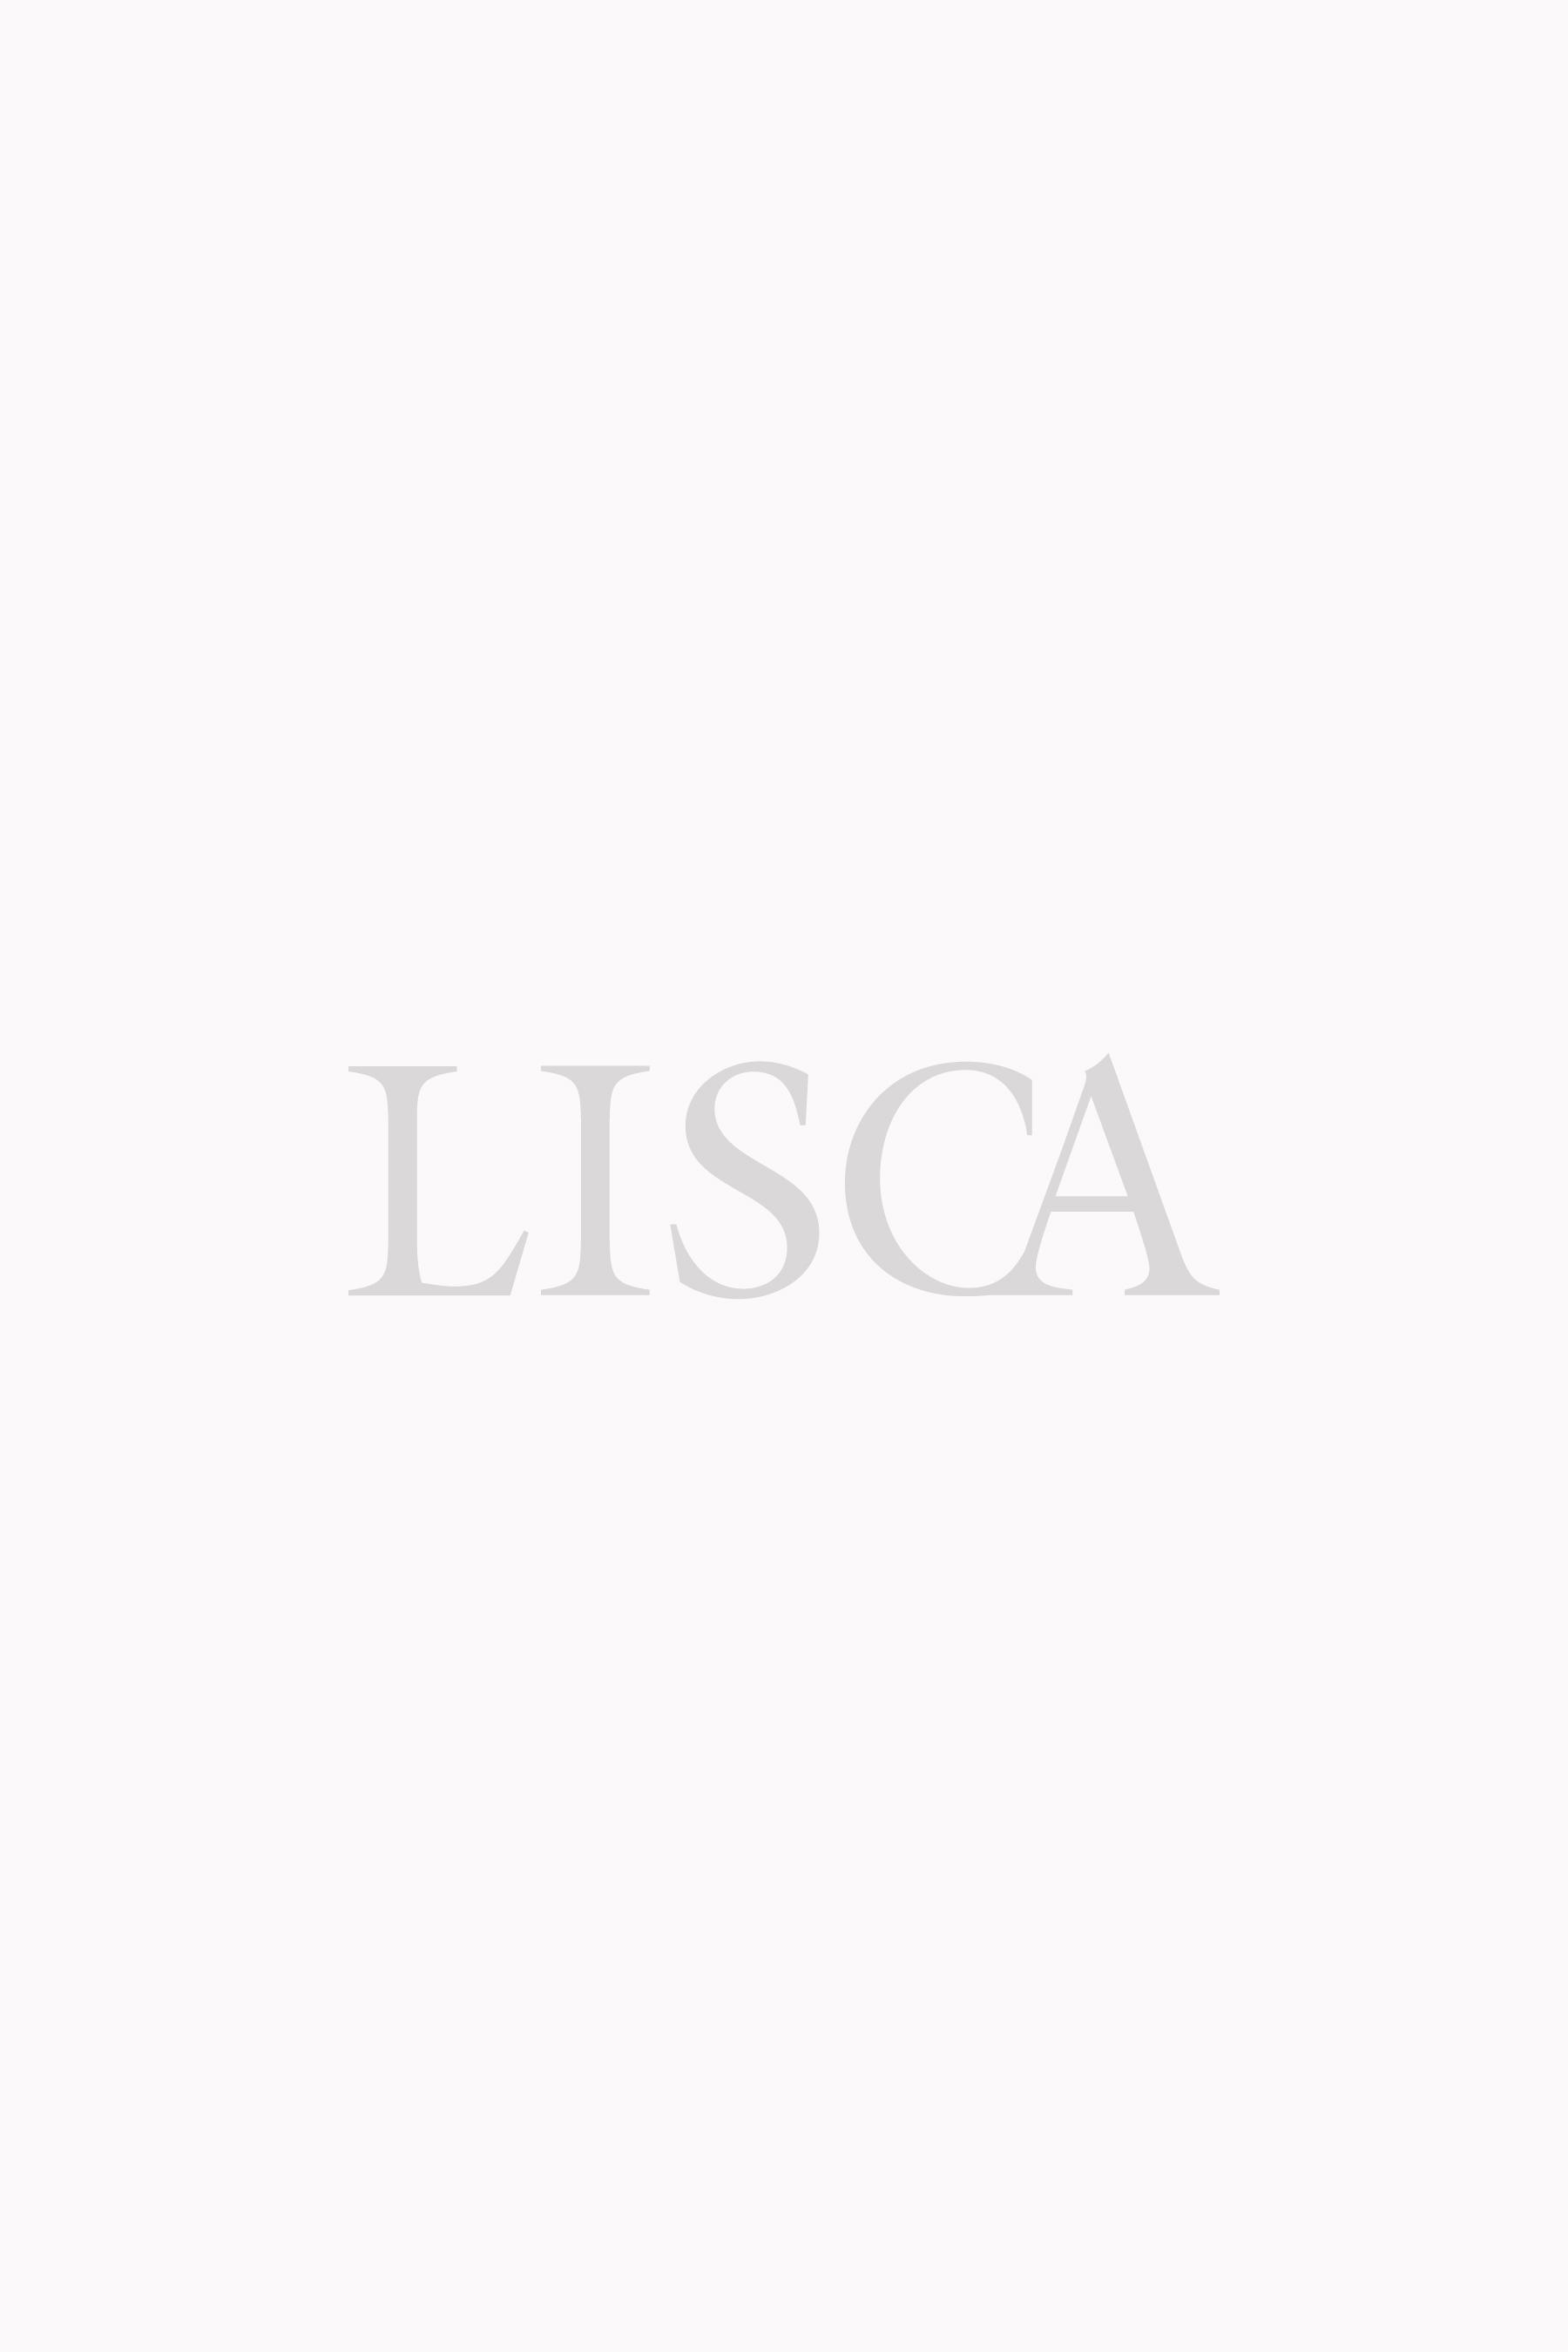 Pidžama: Tunika i leggings hlače »Amaze«